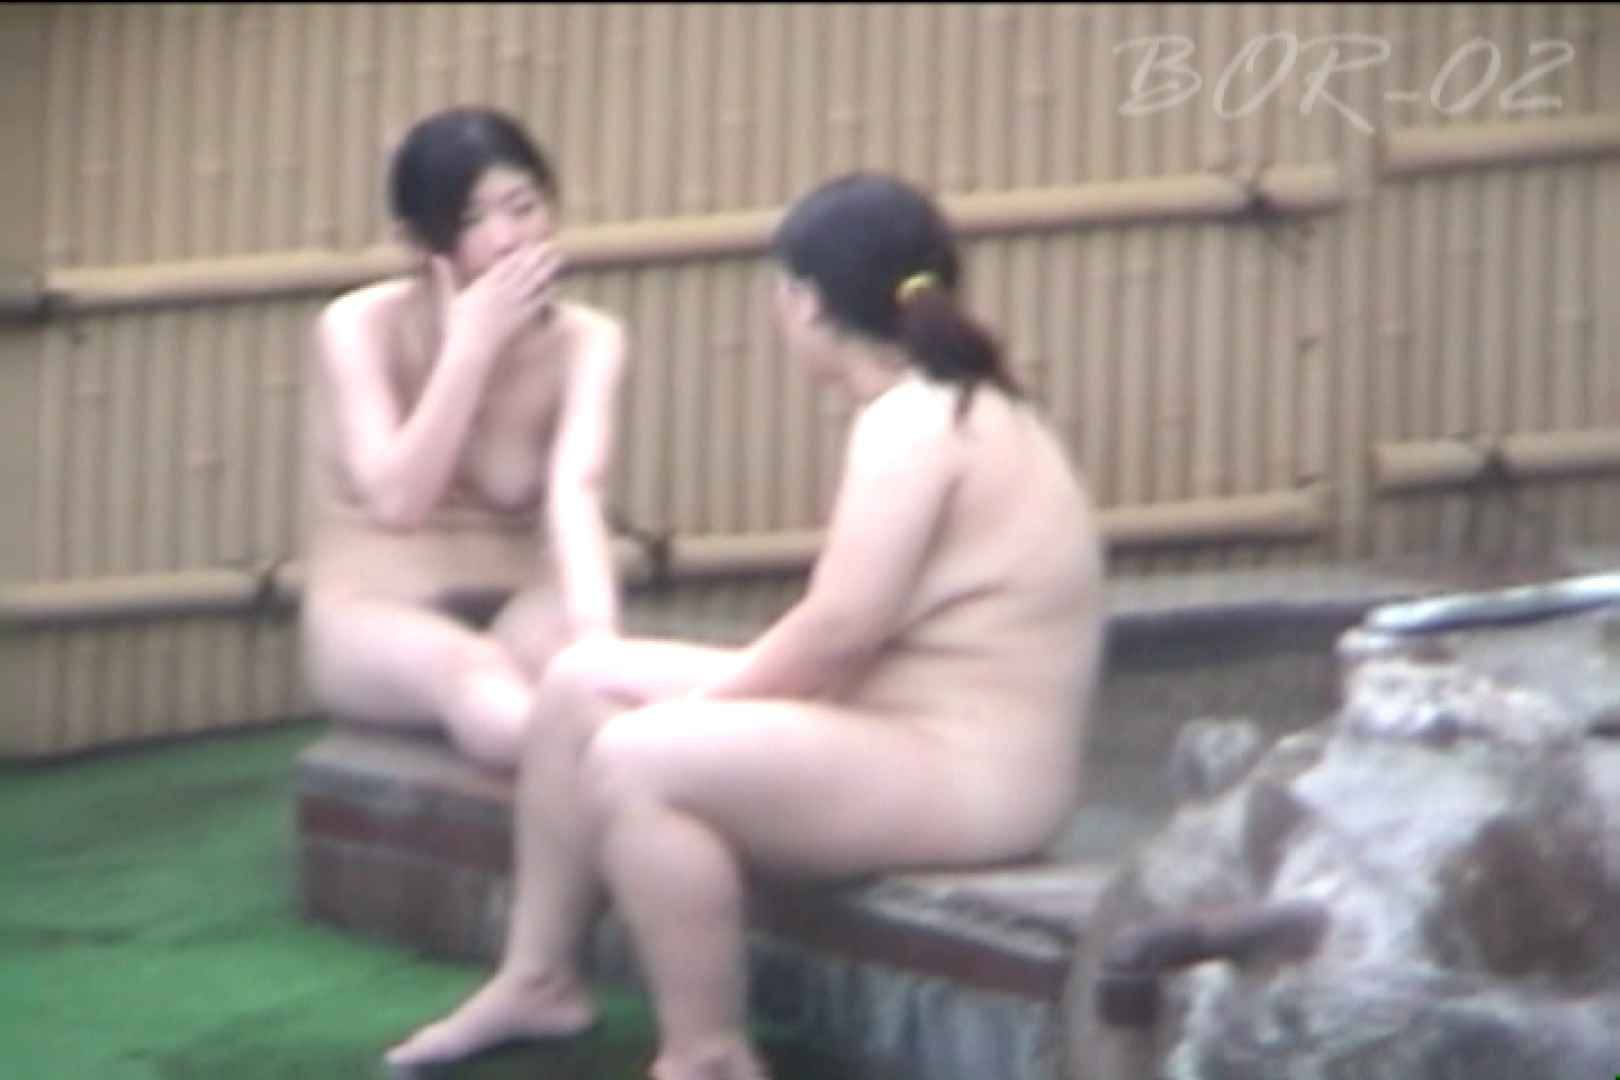 Aquaな露天風呂Vol.471 盗撮 | HなOL  66pic 18